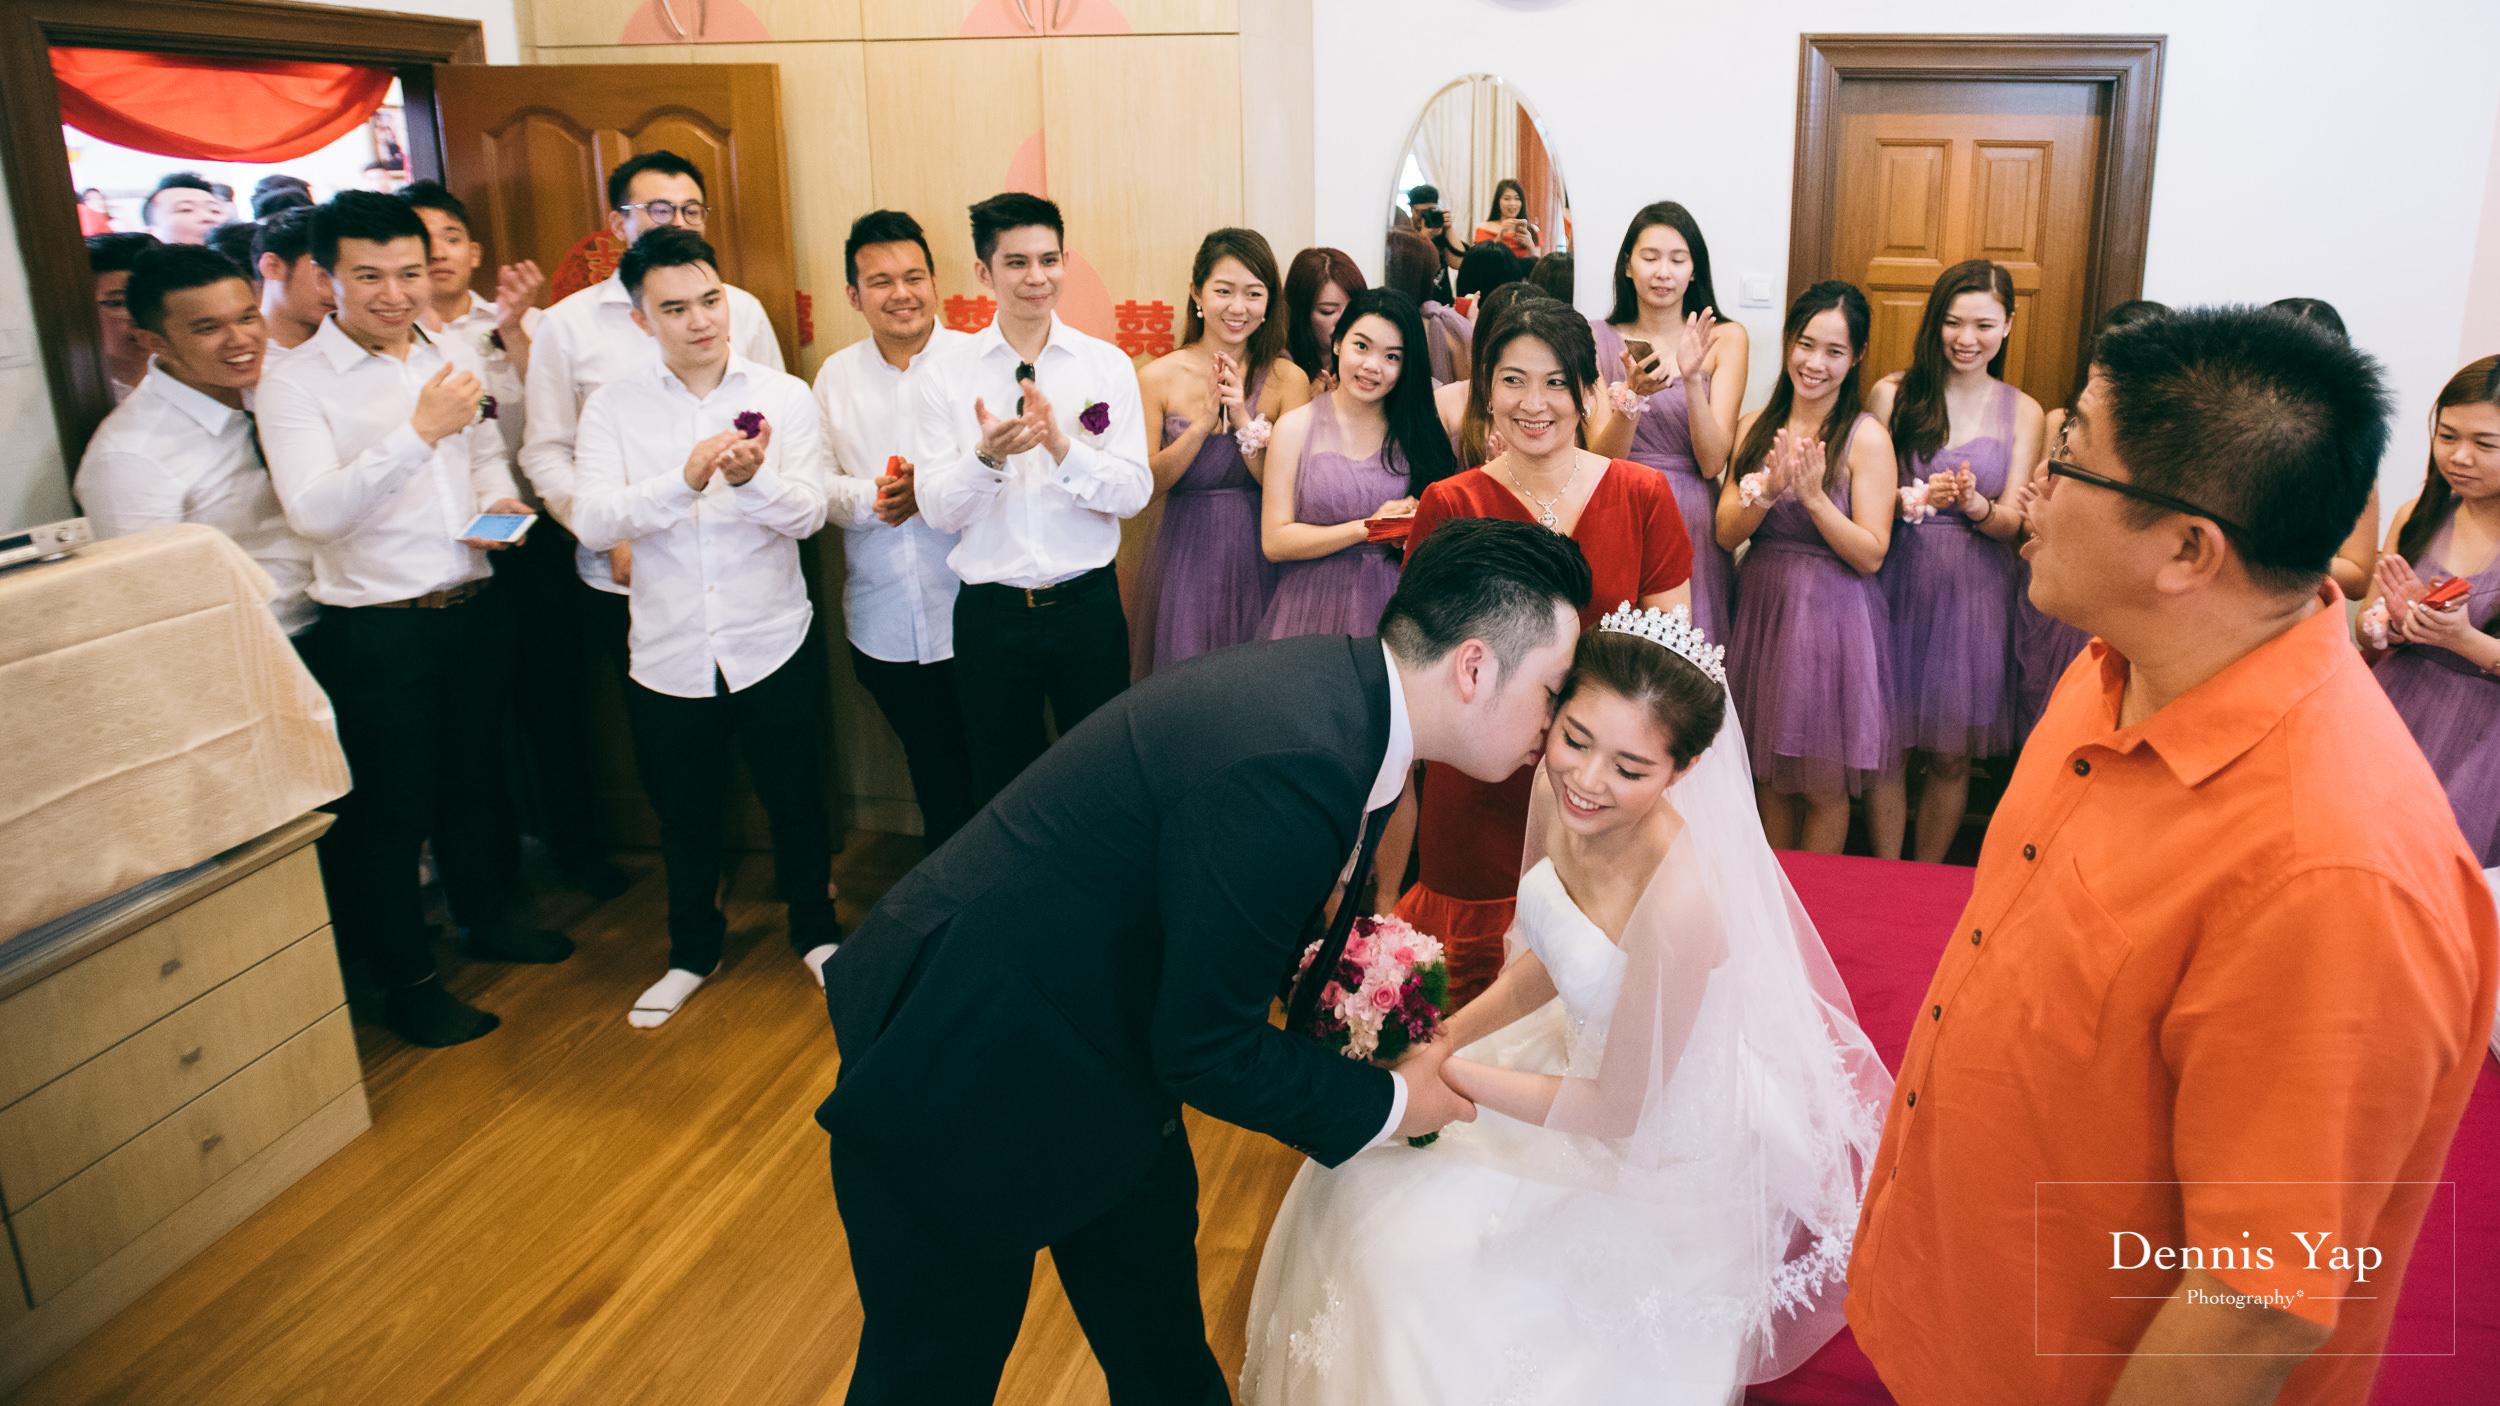 ivan constance wedding day renaissance hotel dennis yap photography-23.jpg